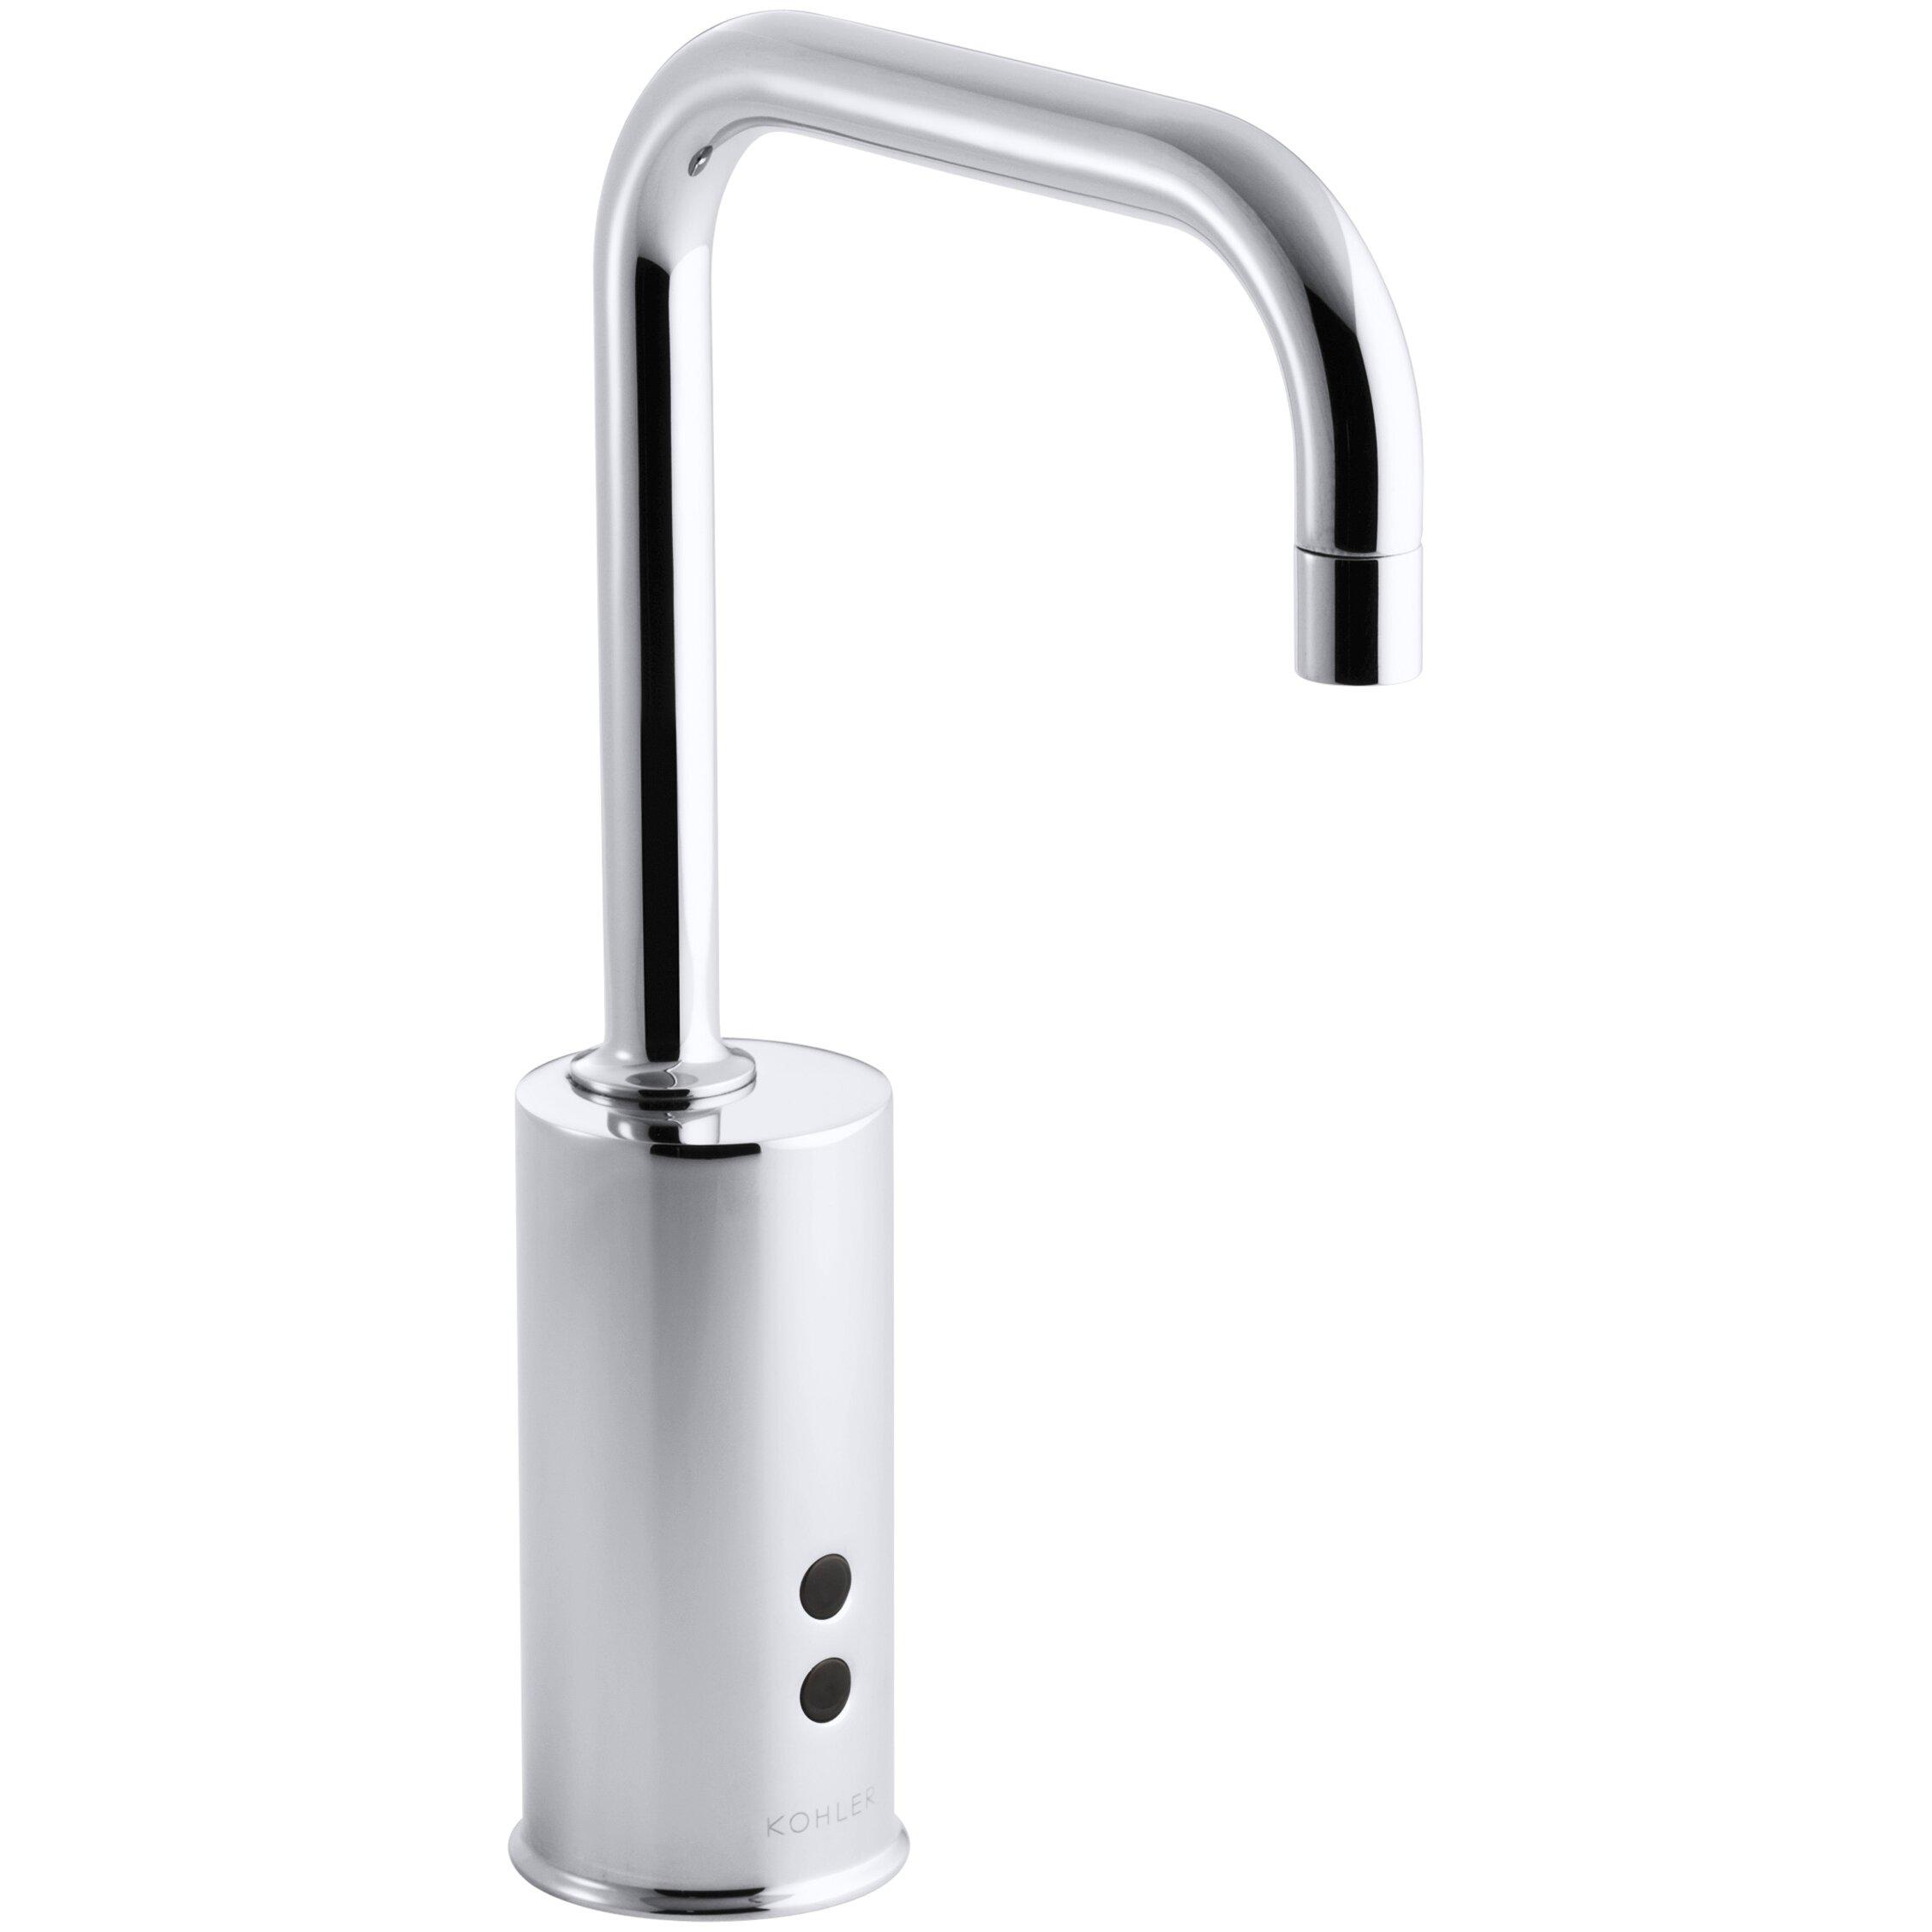 ... Pull Down Kitchen Kohler Commercial Kitchen Faucets. Iranbourse.co